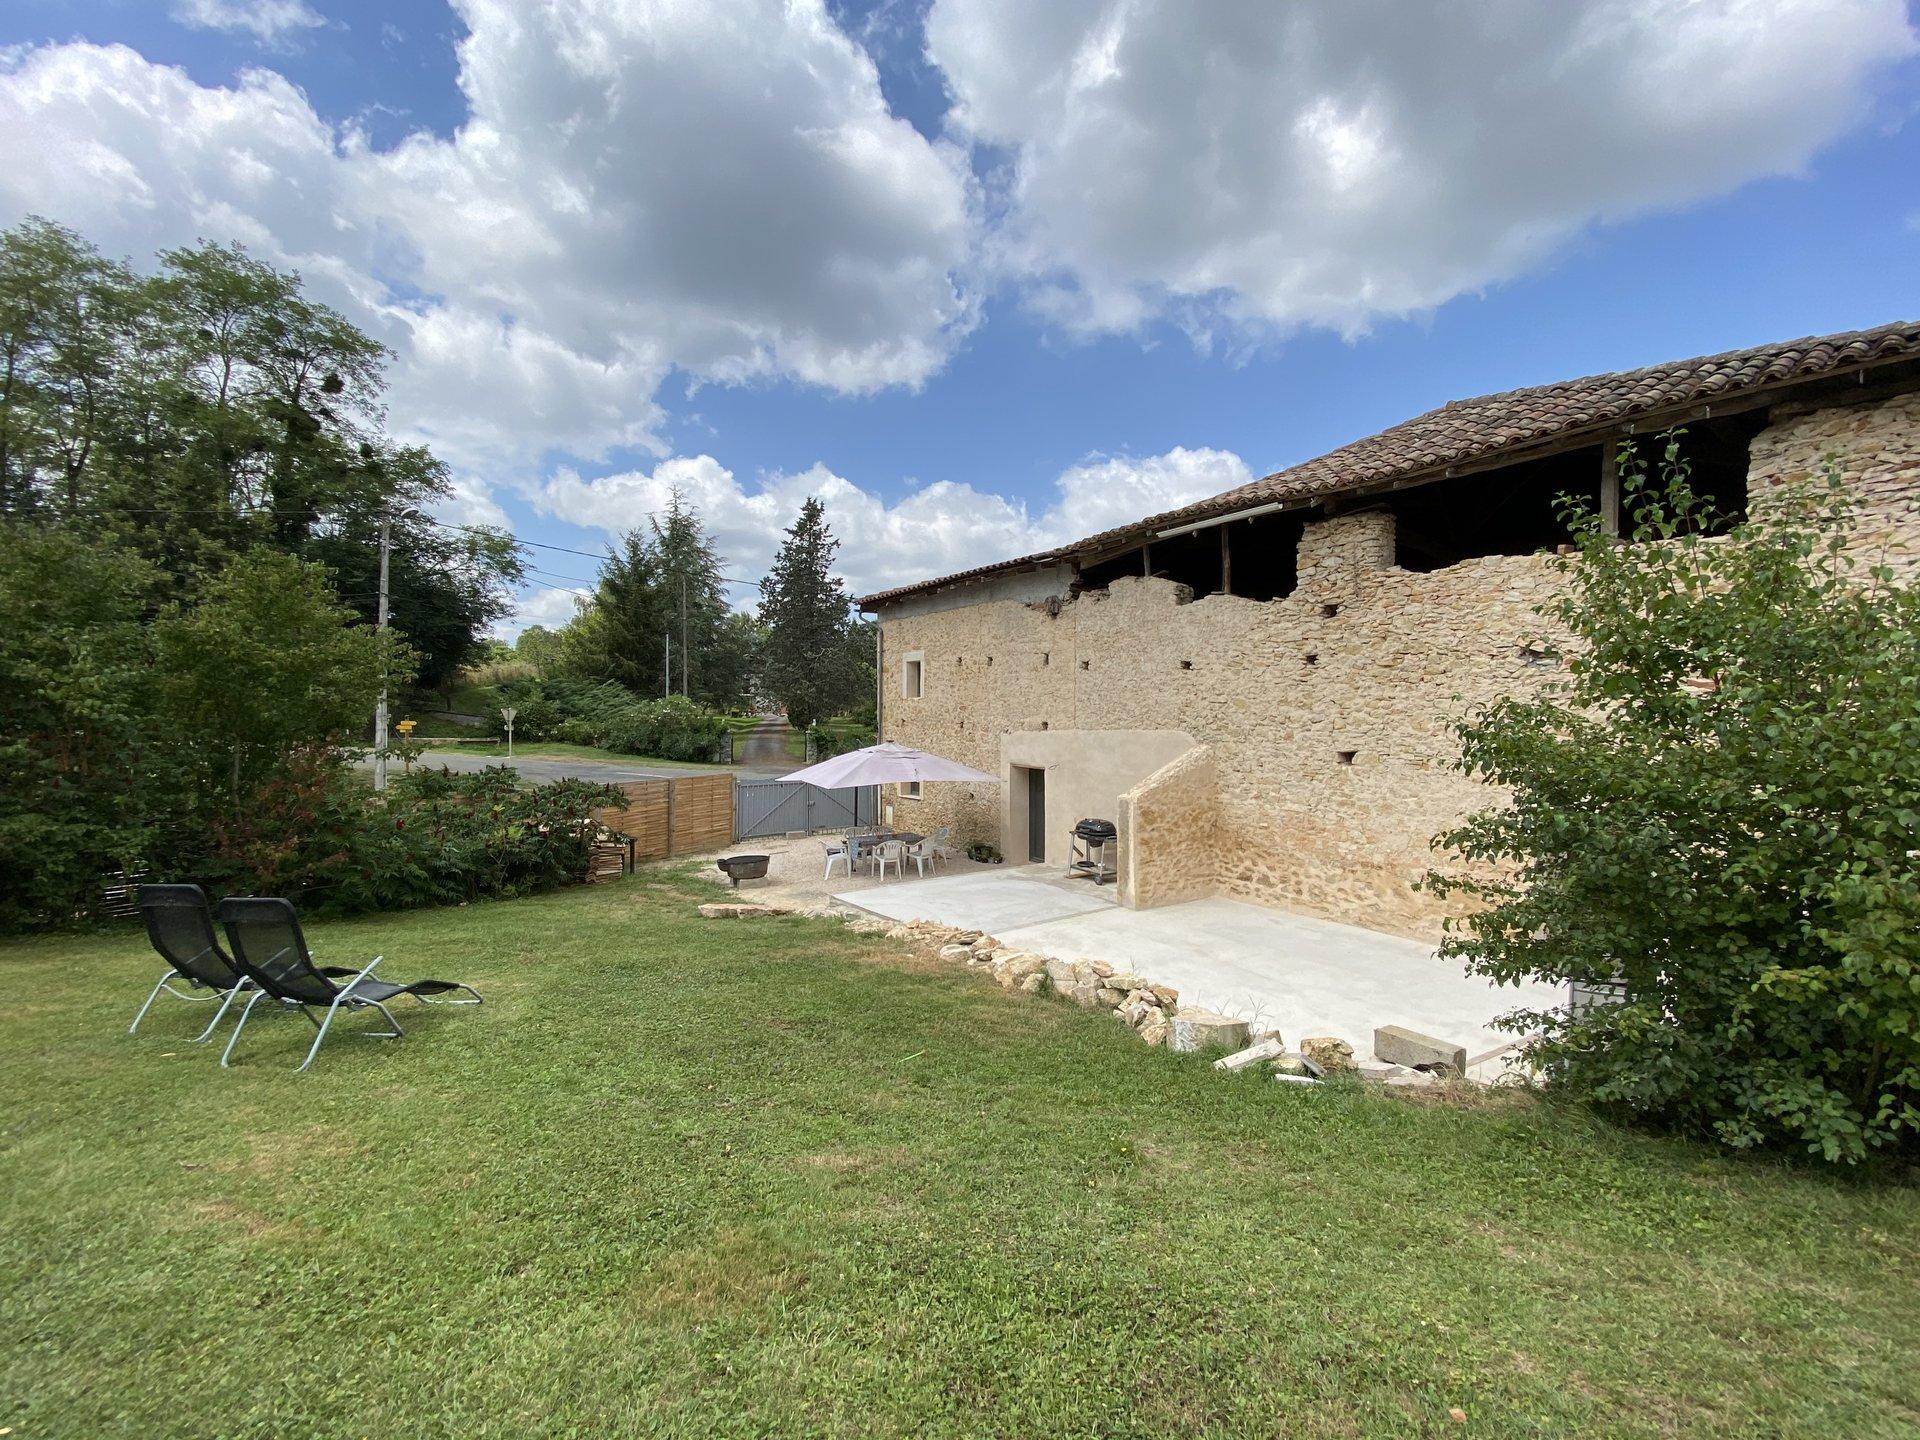 RARE, Aurignac center lovely farmhouse with outbuilding and big garden